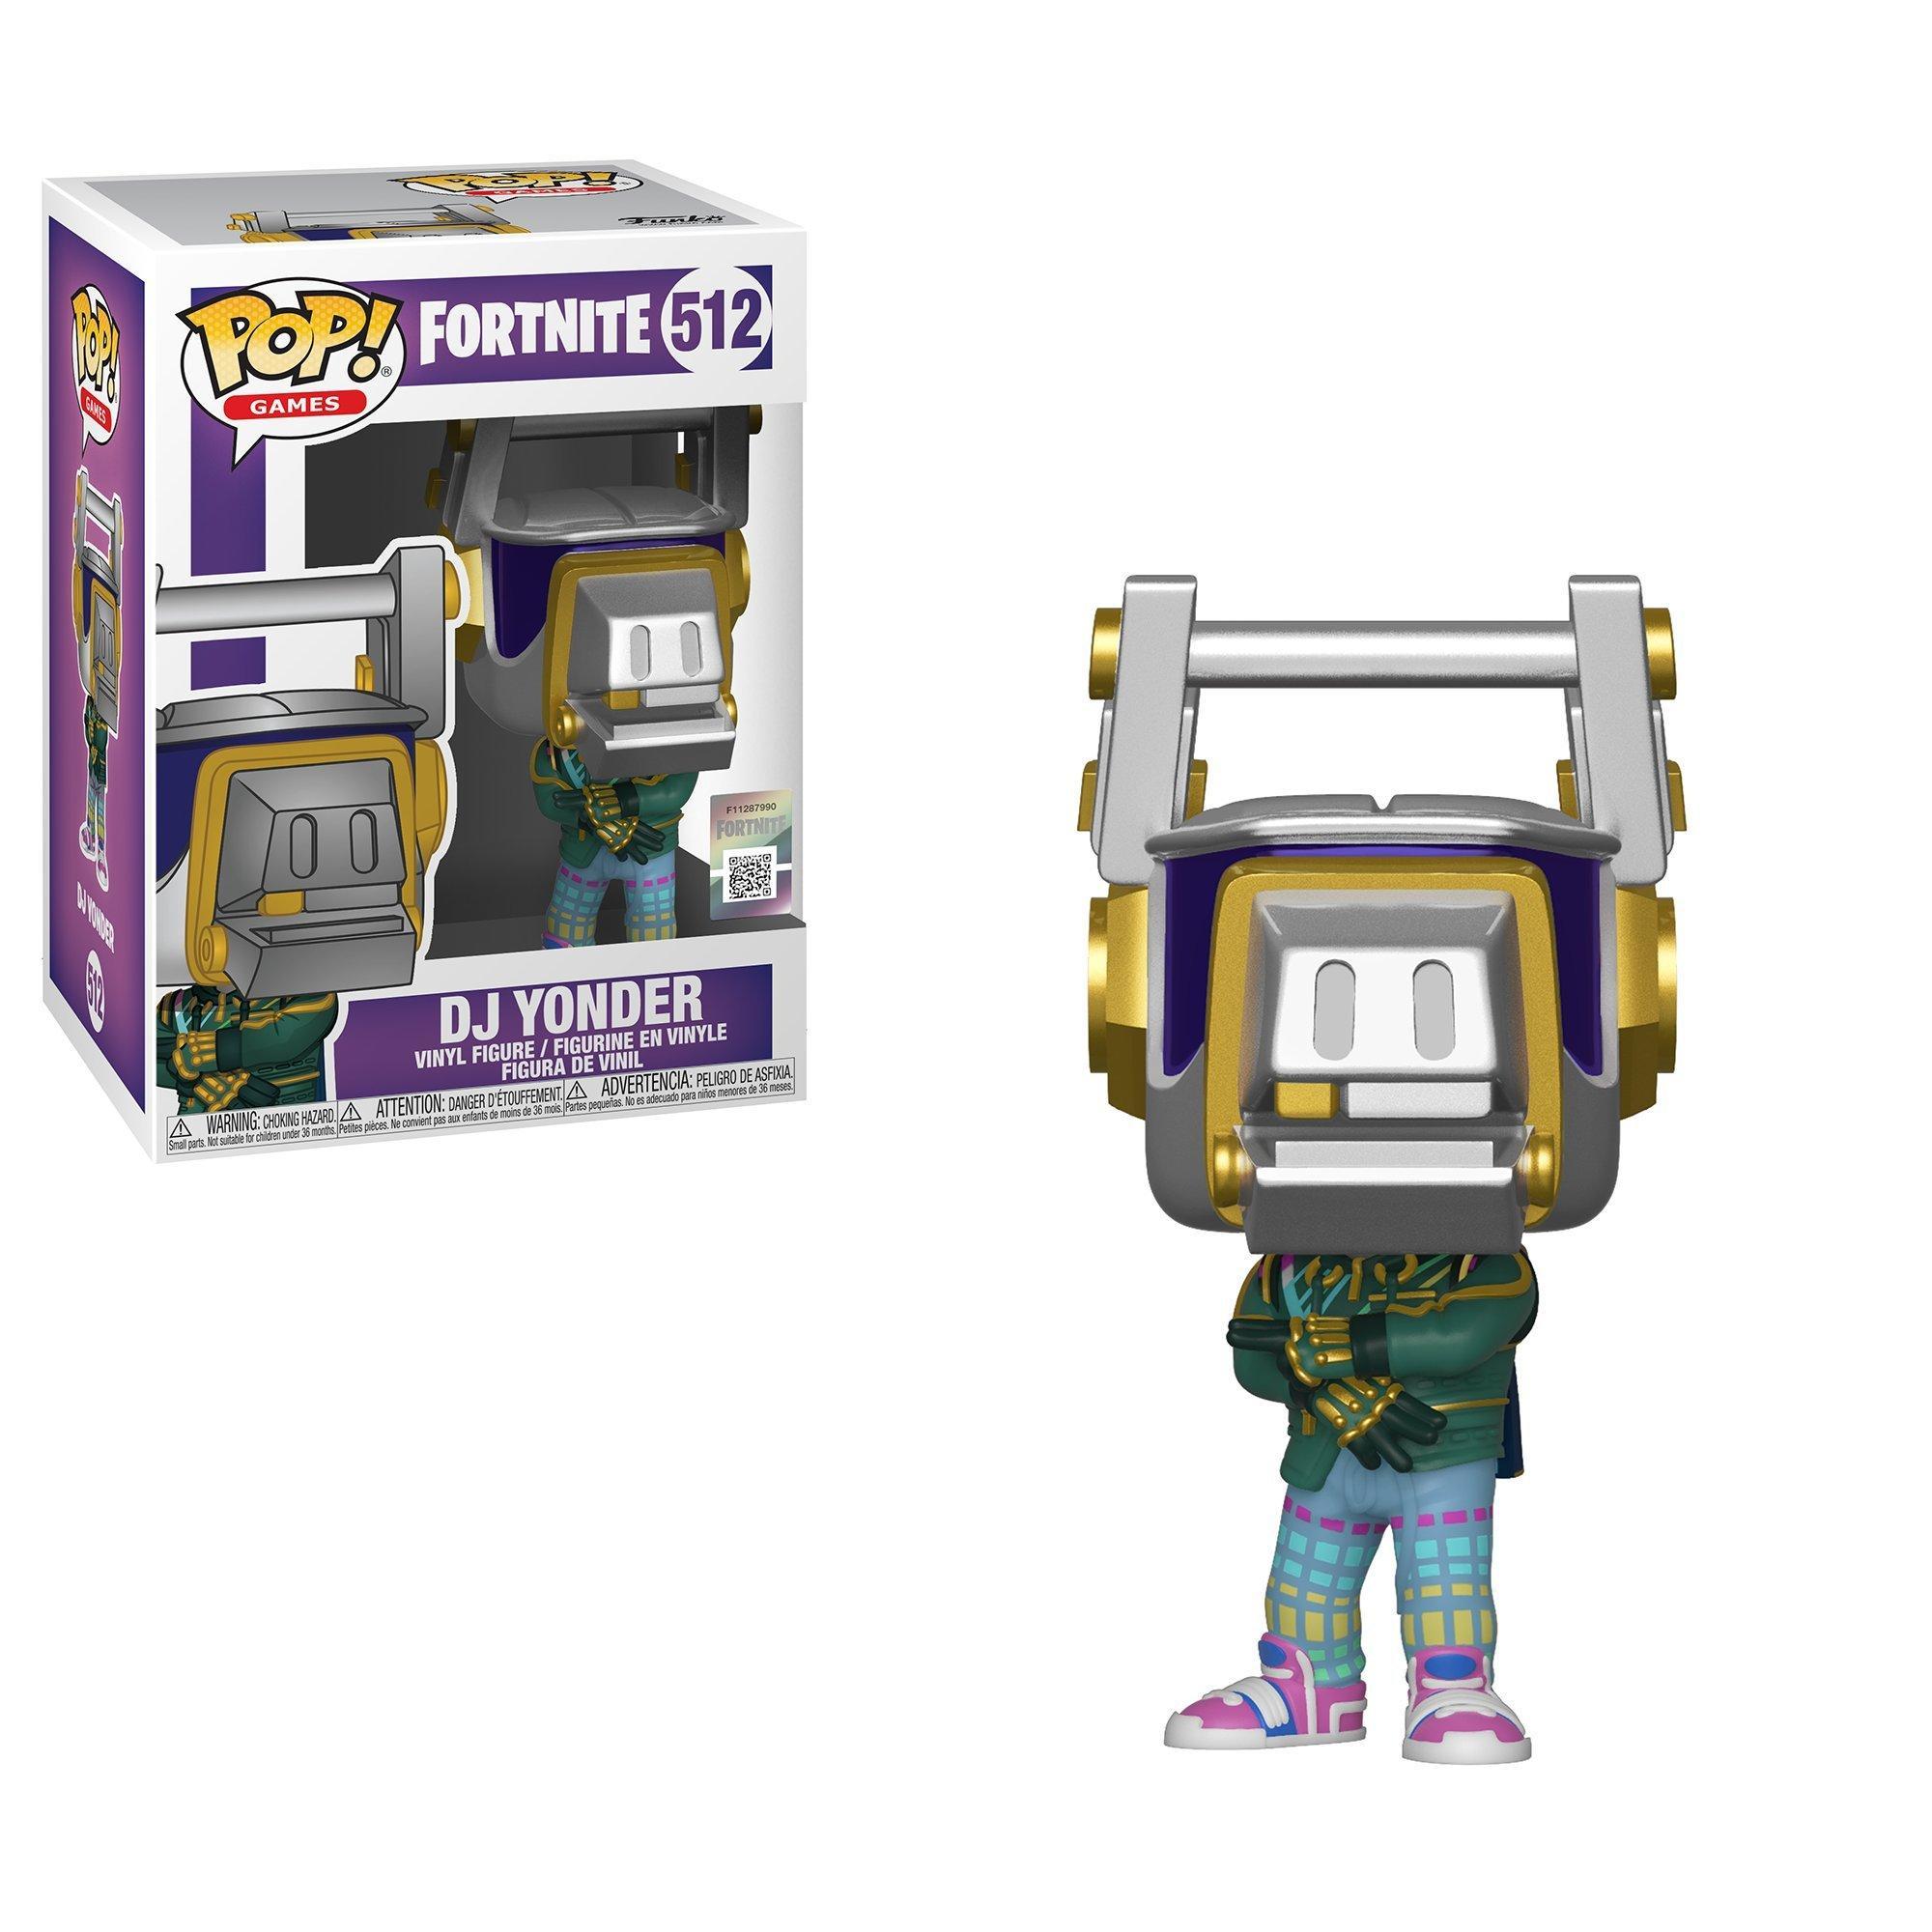 2019, Toy NUEVO Dj Yonder Fortnite Funko Pop Games: